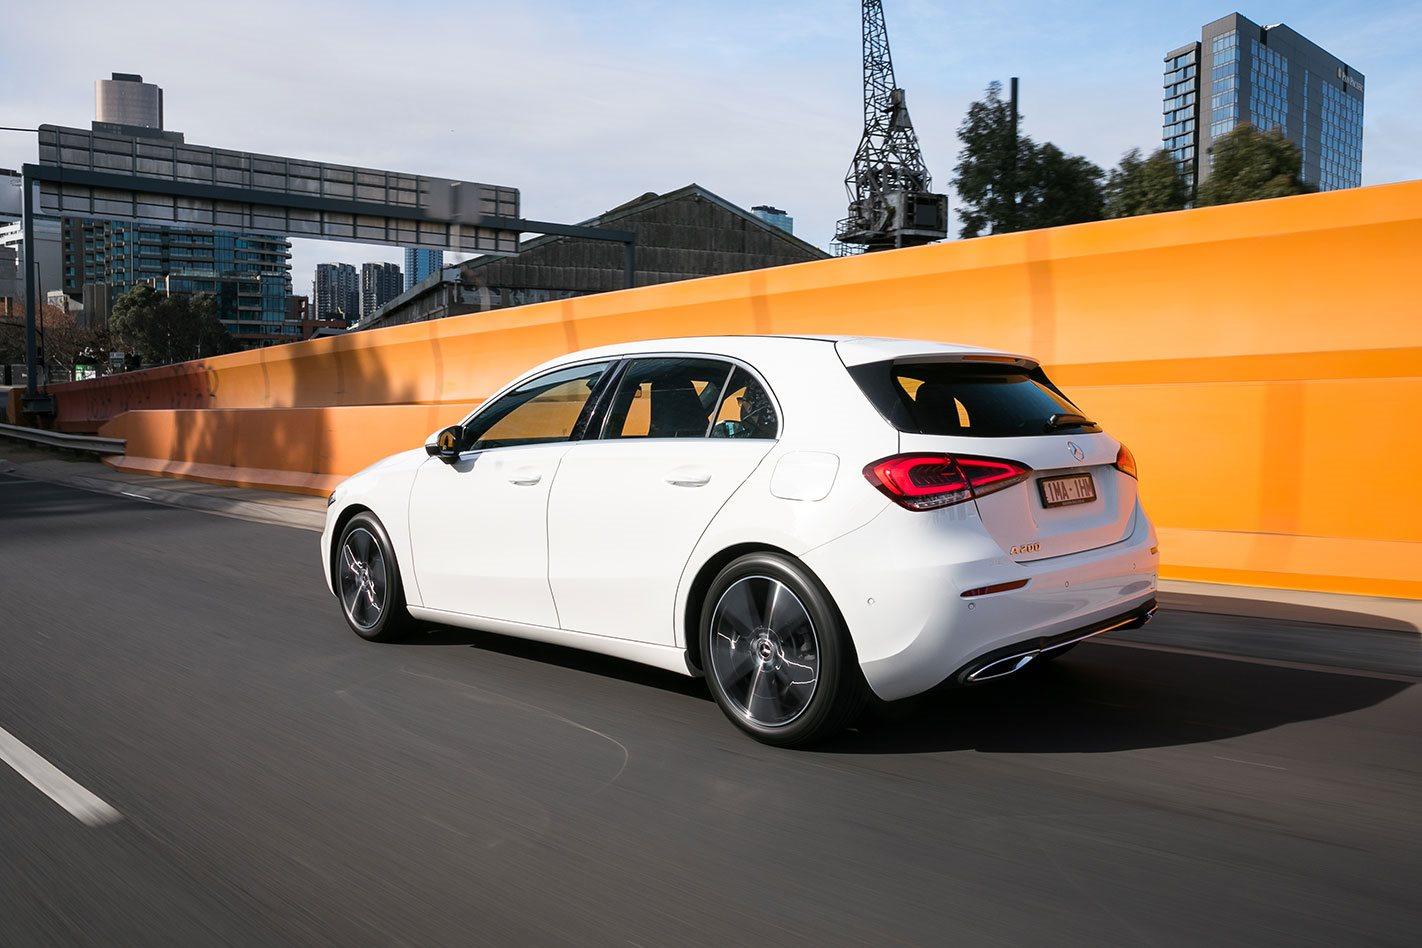 2019 Mercedes Benz A200 Review